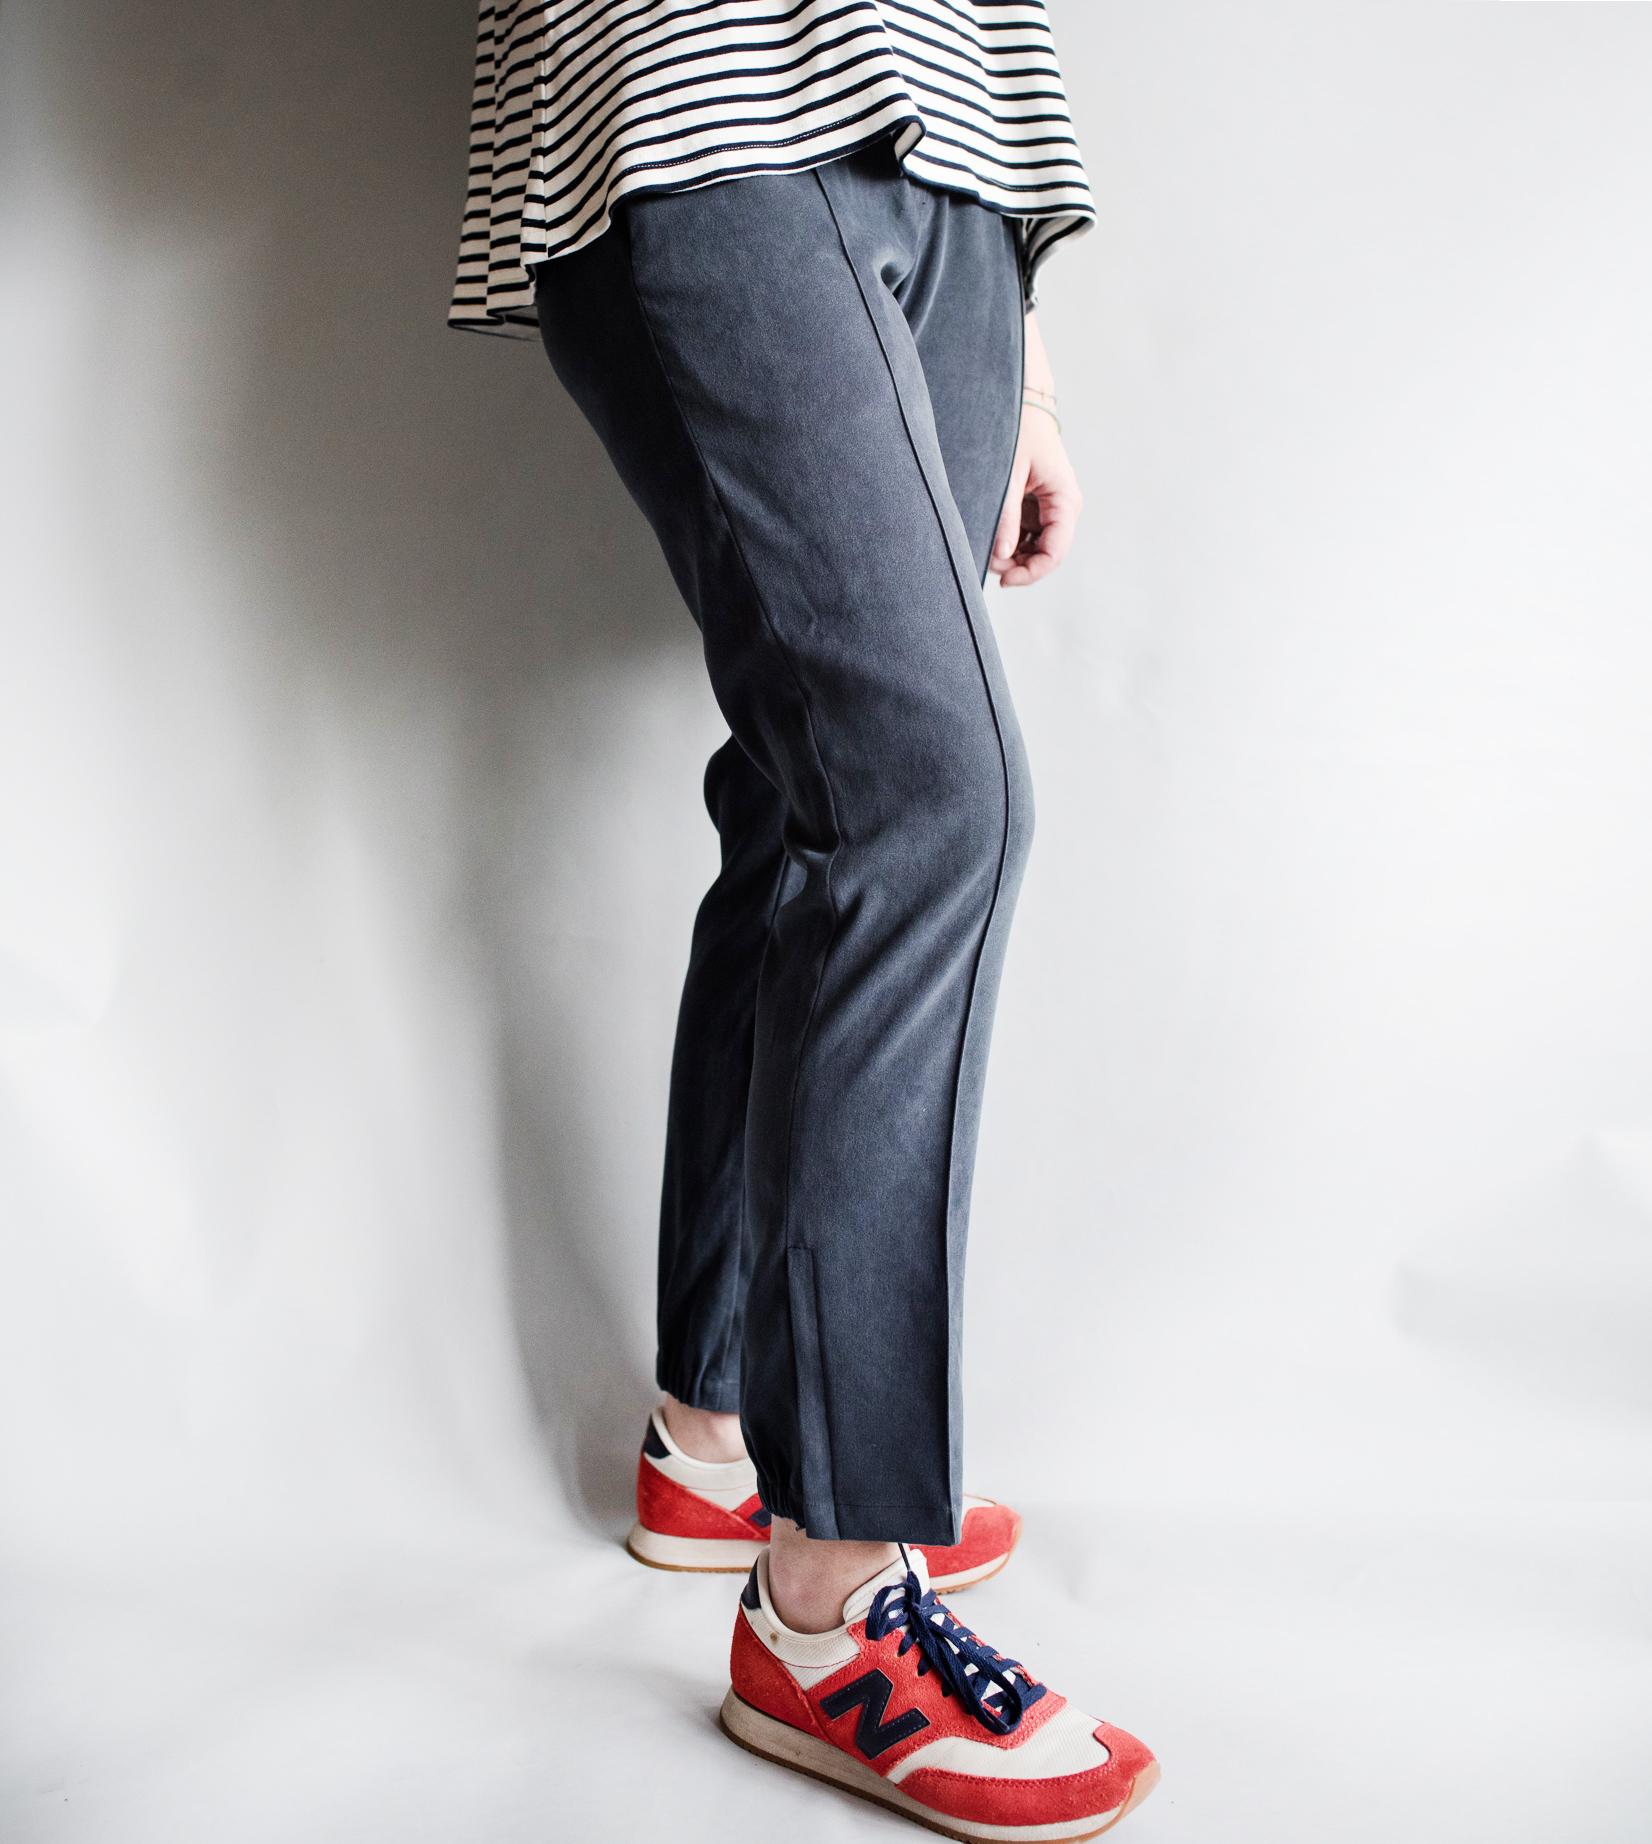 robinson-pdf-sewing-trouser33.jpg